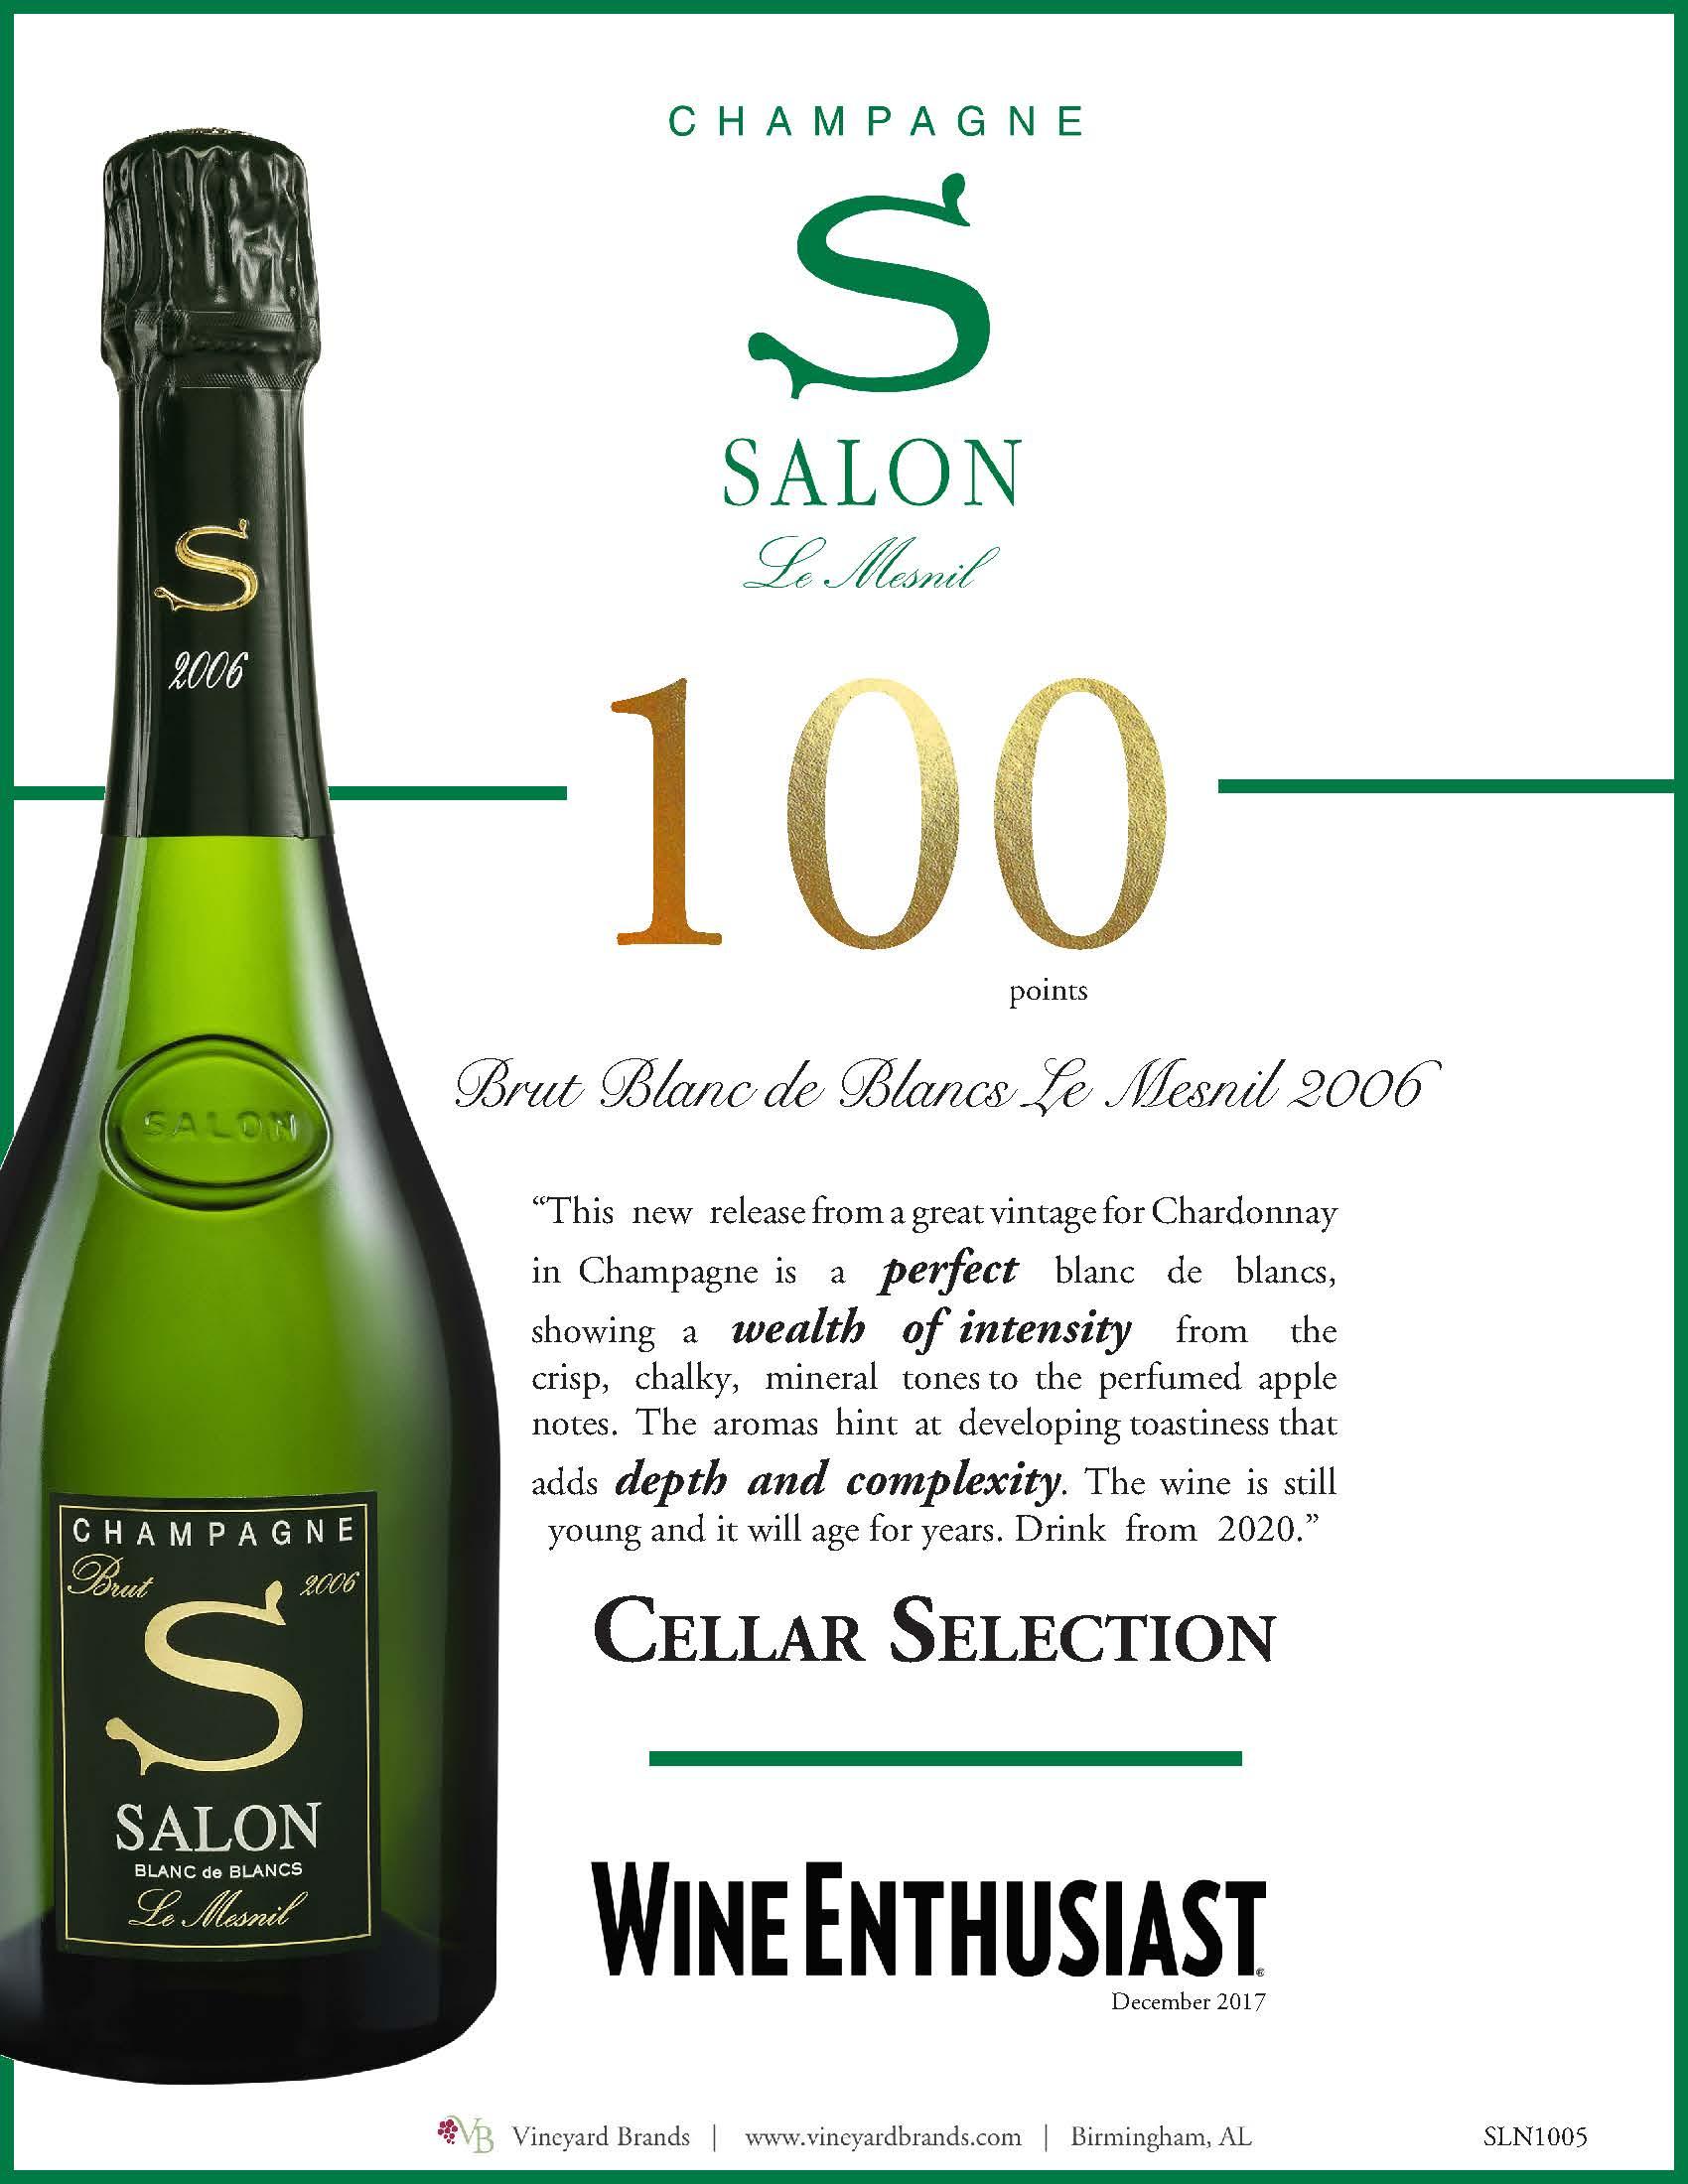 Champagne Salon 2006.jpg